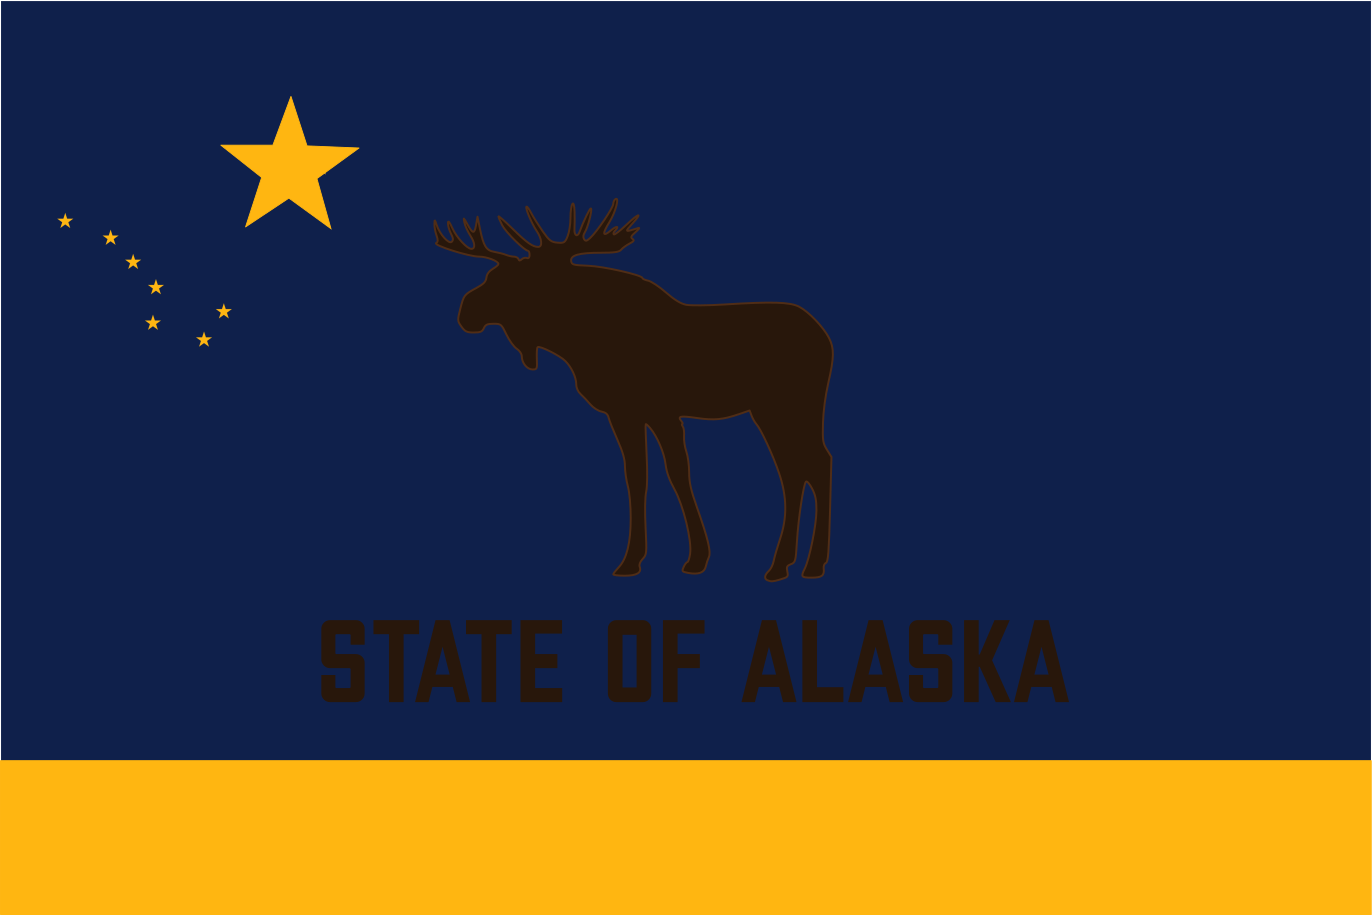 State of Alaska flag.png